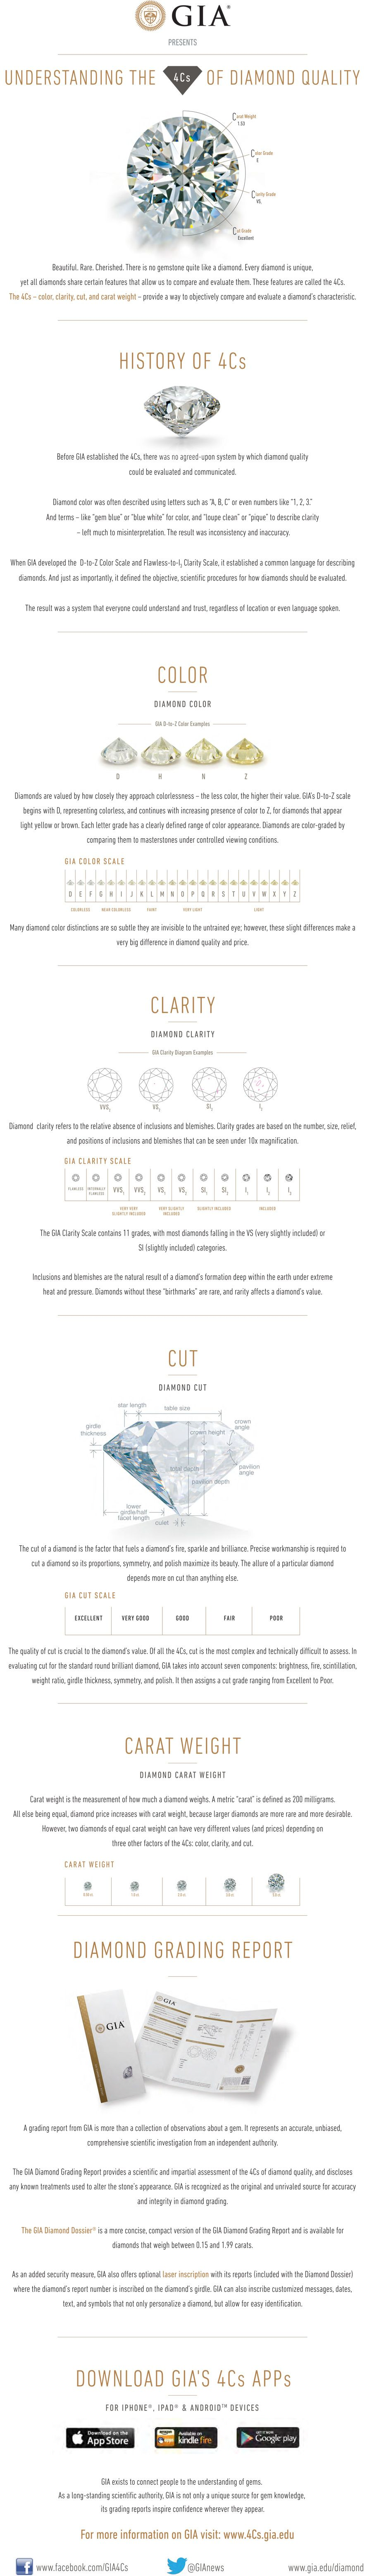 4Cs Diamond Quality Infographic. GIA (020414)